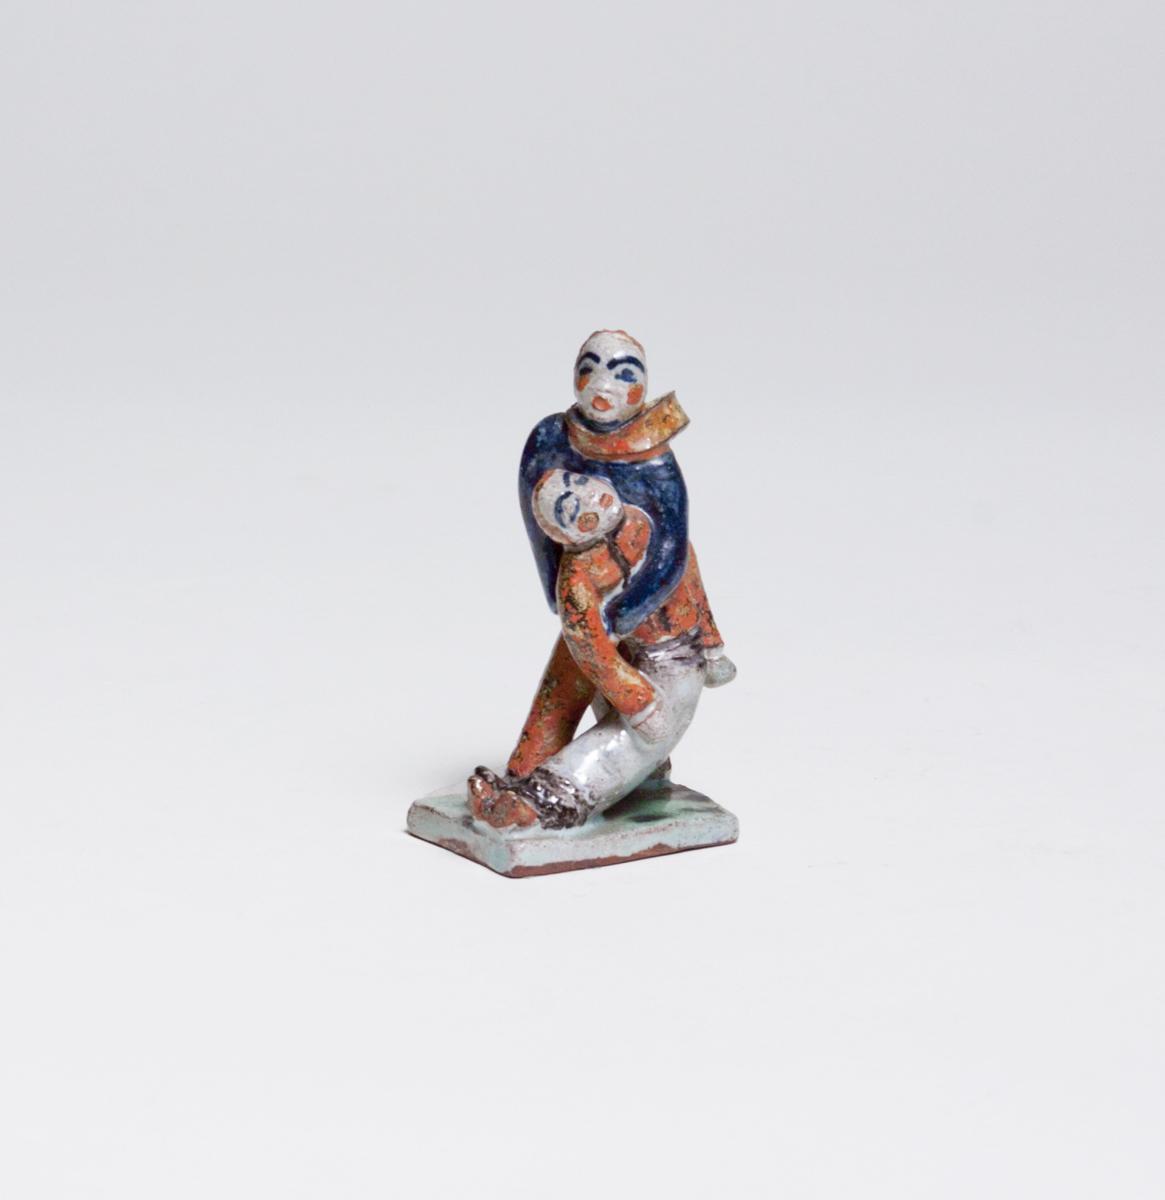 Wiener Werkstätte  Miniature Figural Group 1